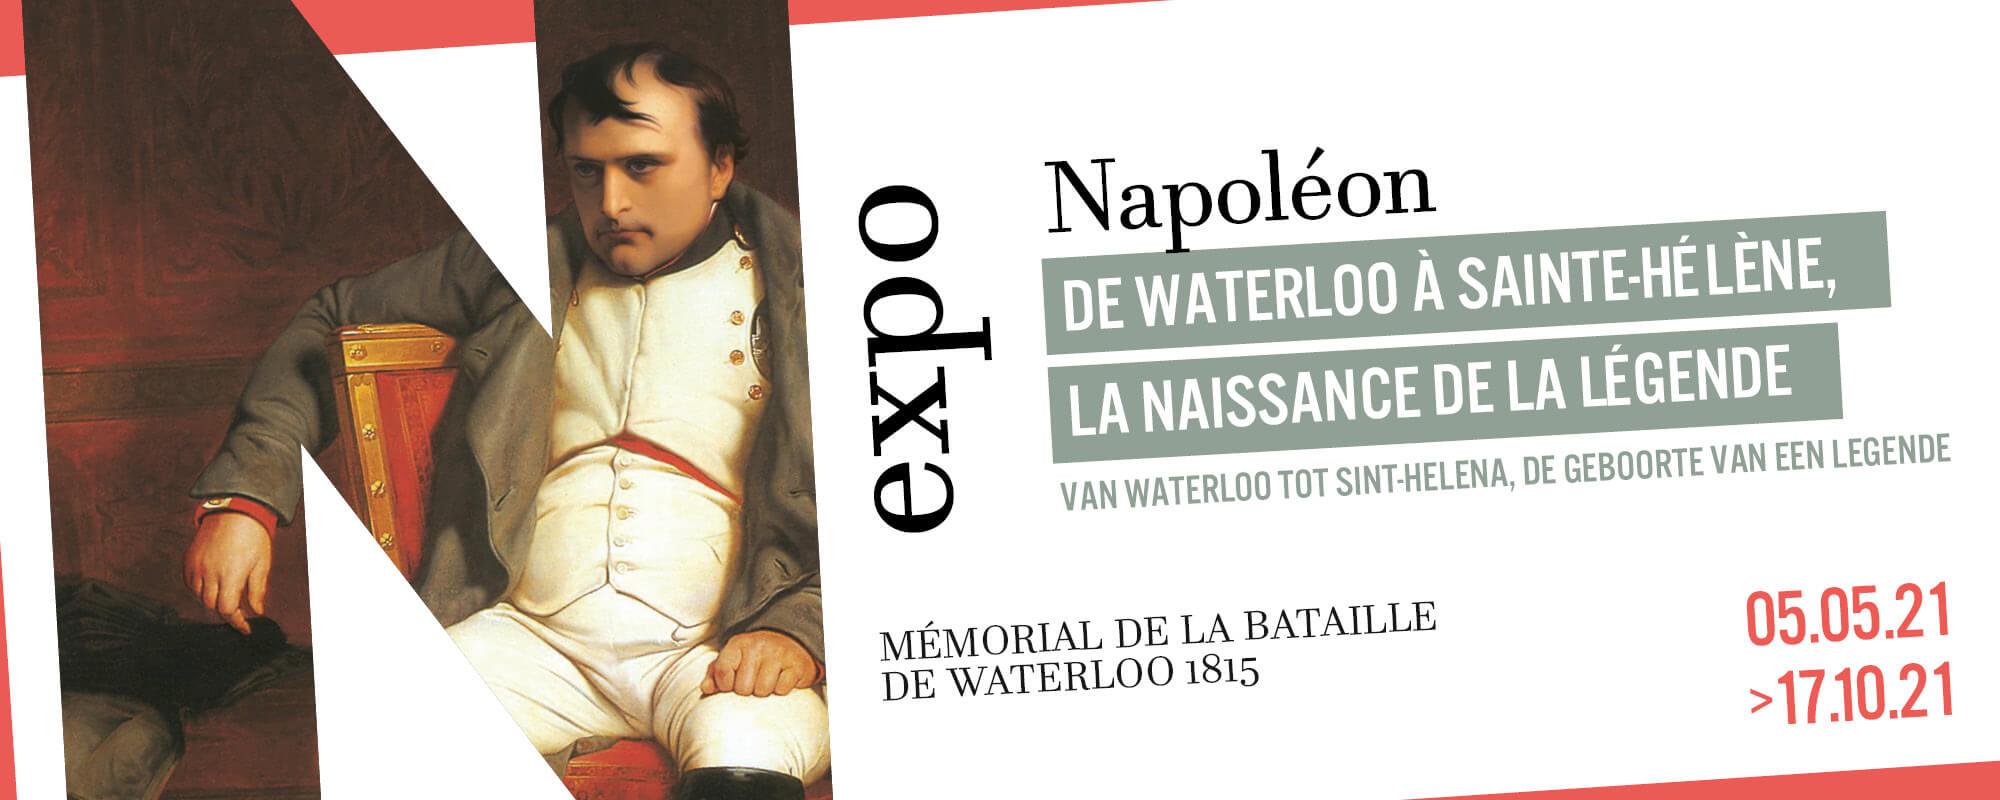 visuel expo napoleon memorial waterloo 1815